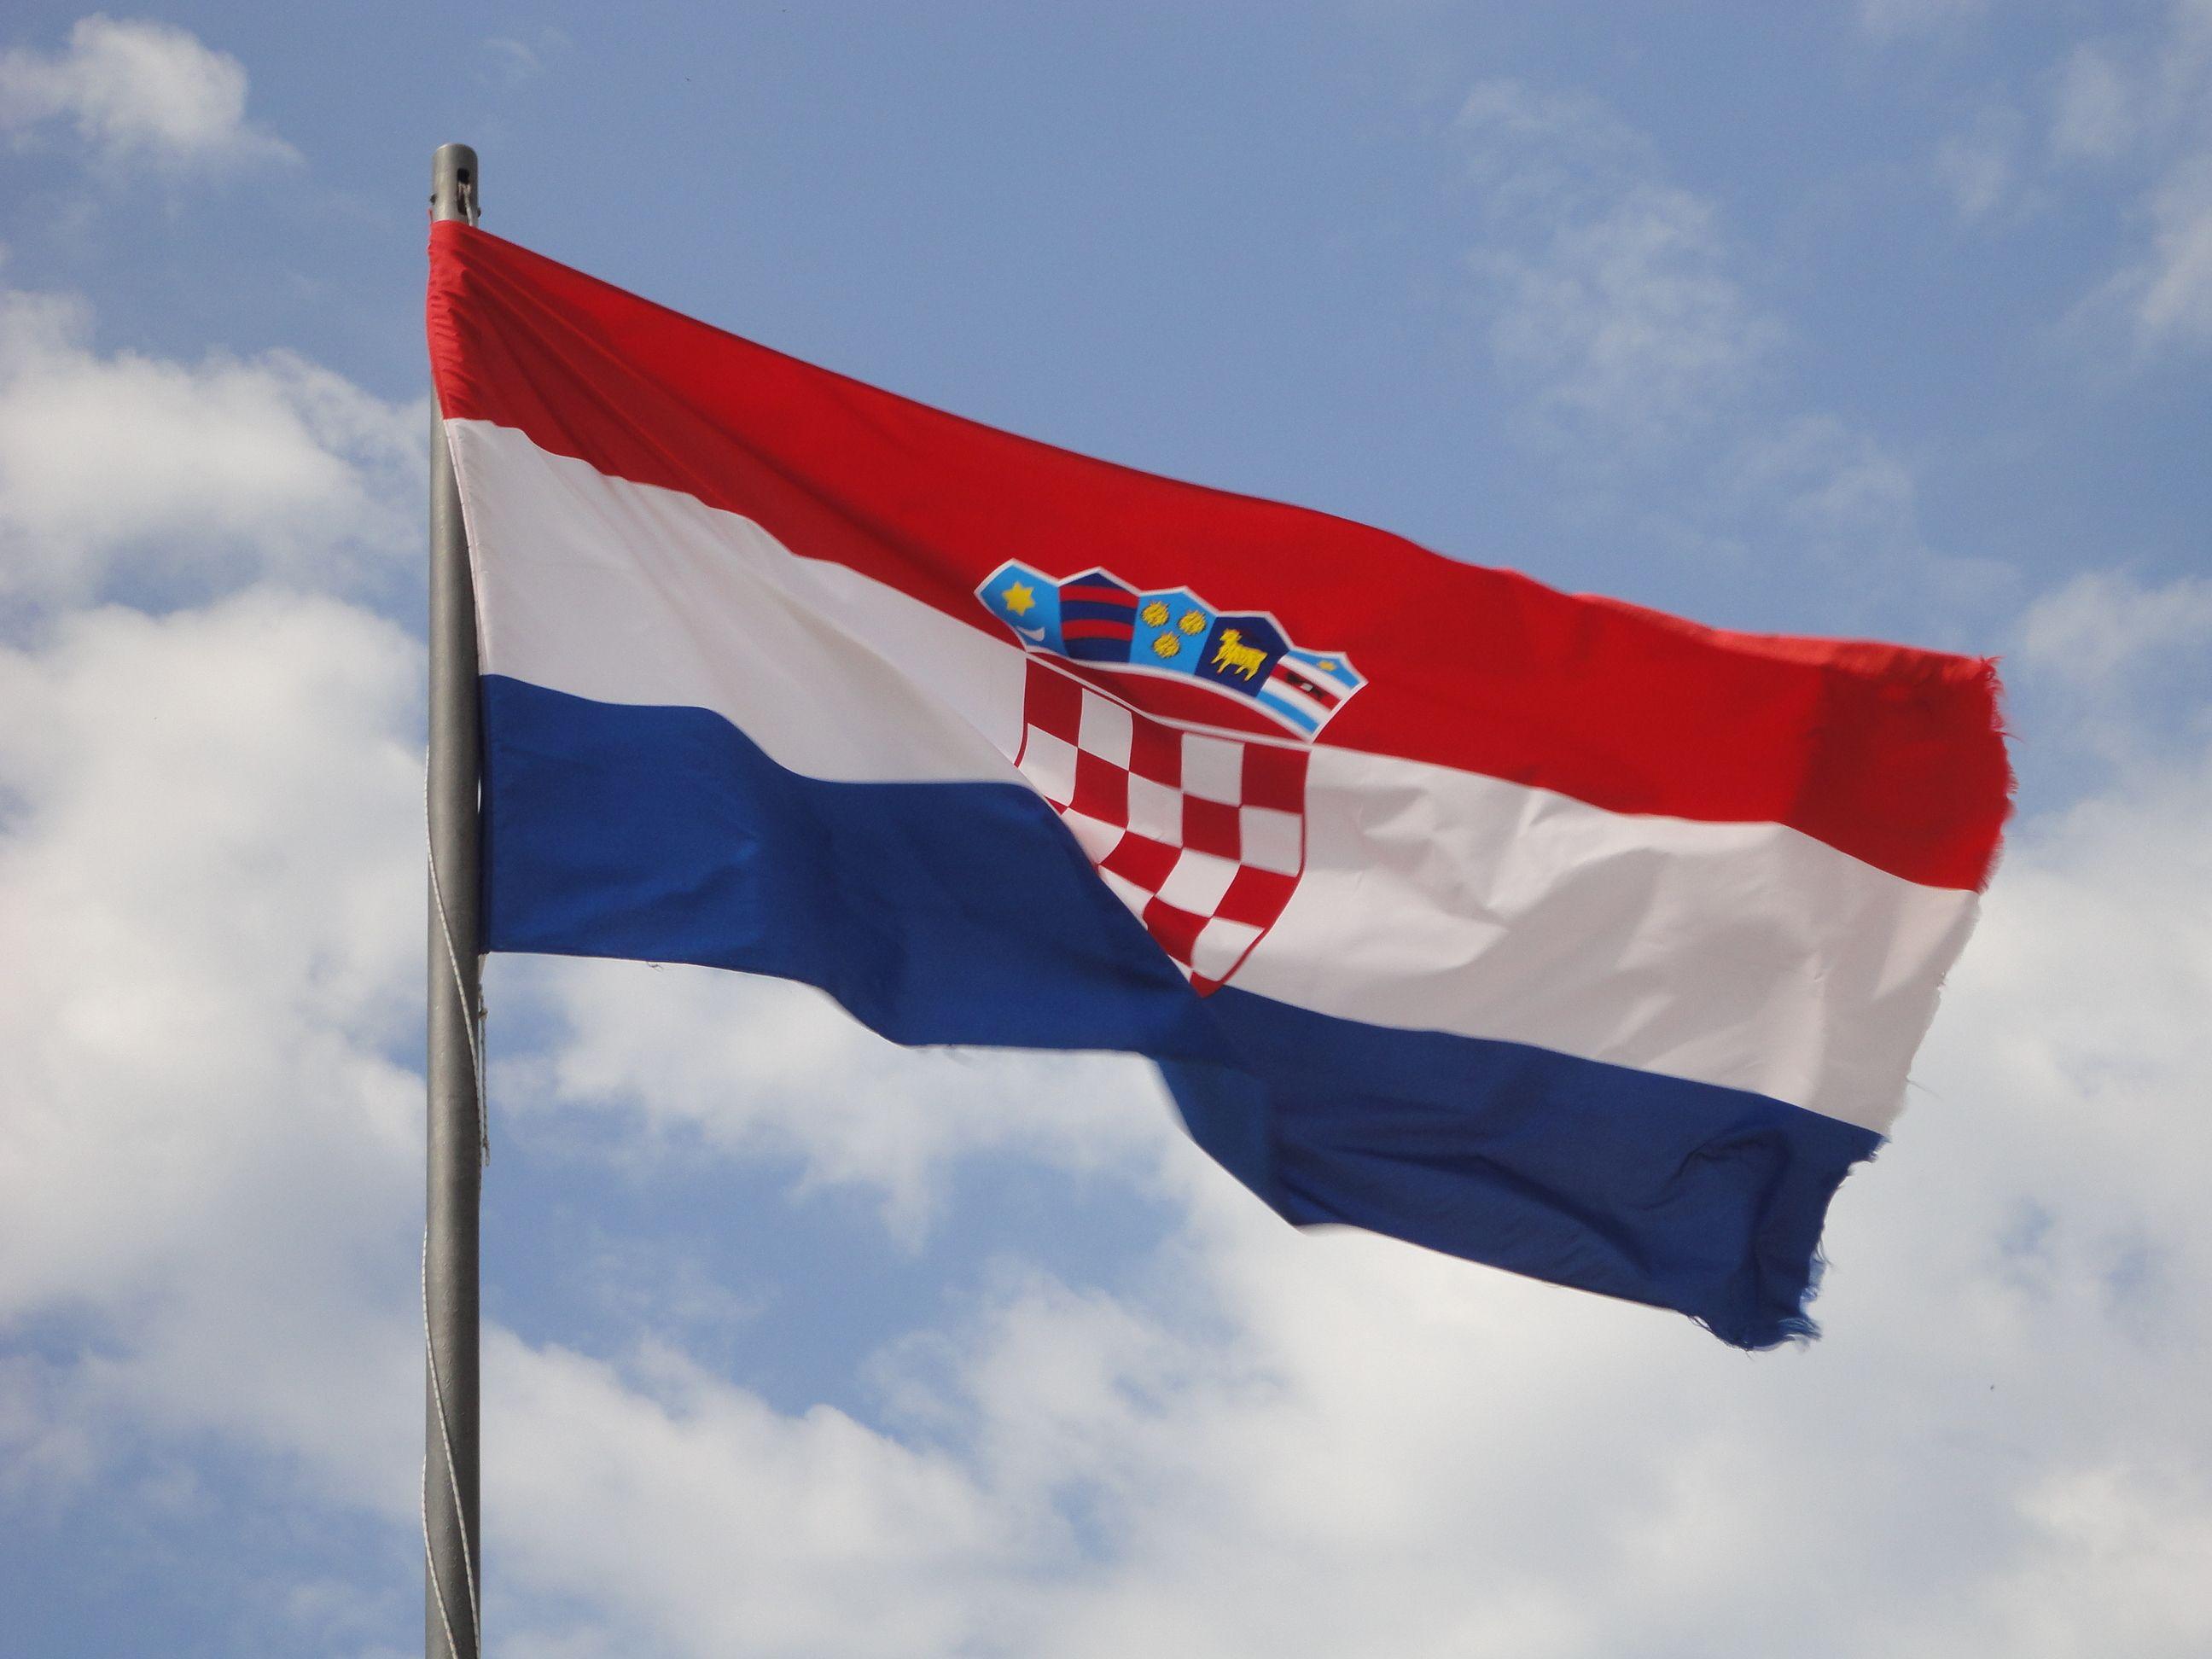 croation flag